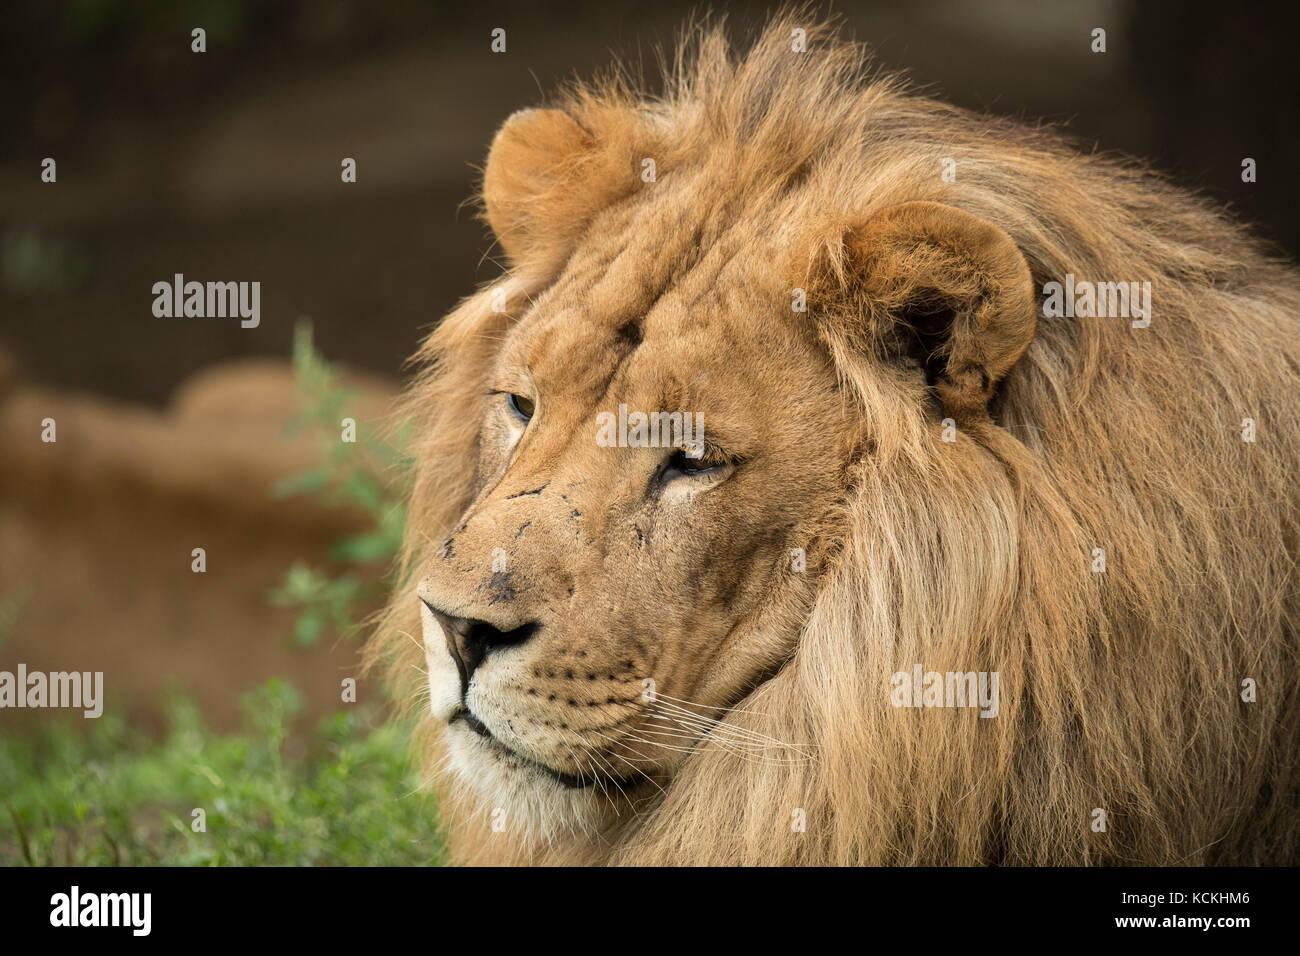 Headshot of a lion - Stock Image